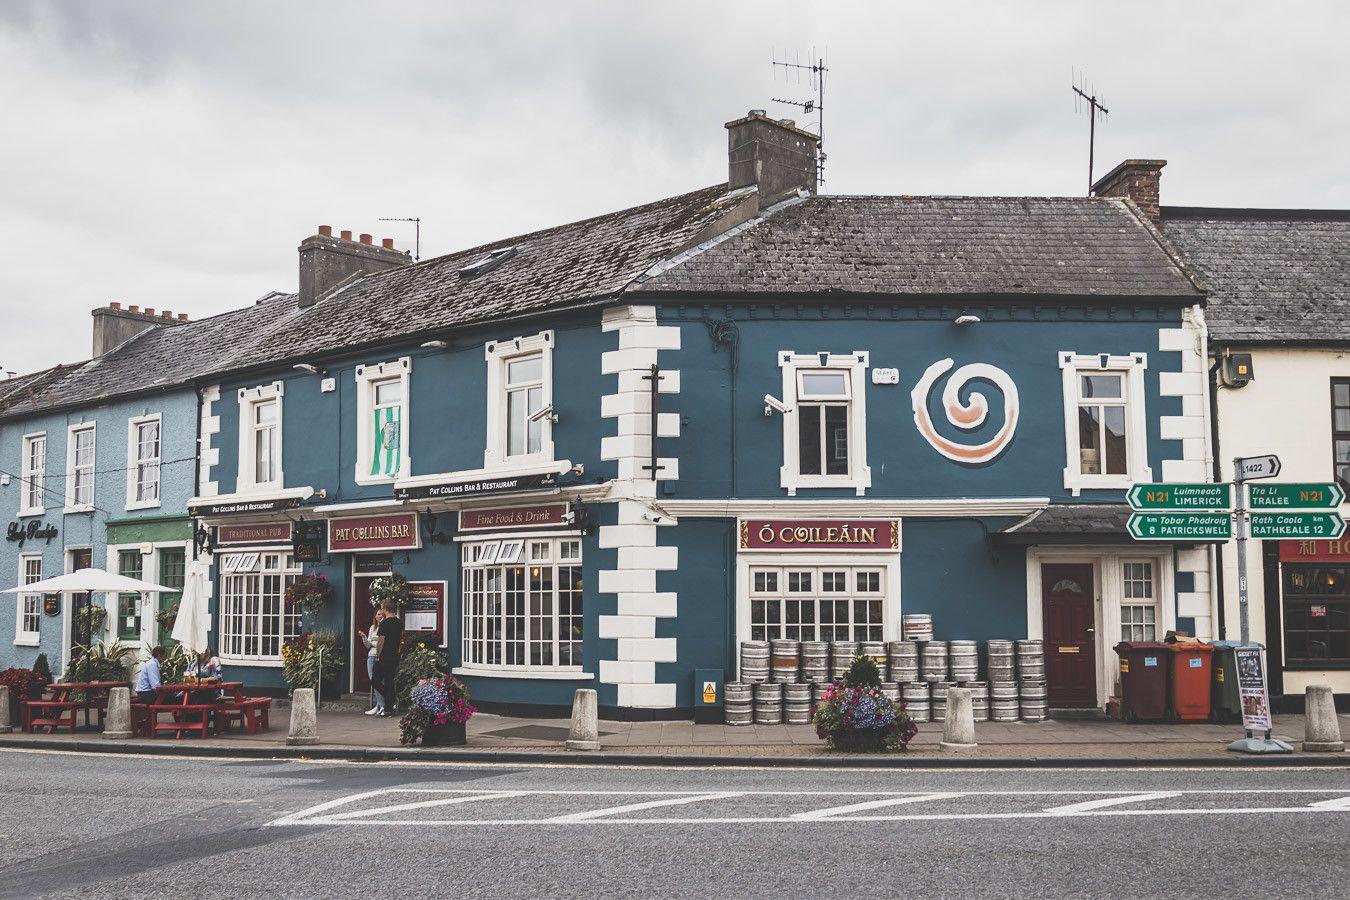 Le charmant village d'Adare en Irlande